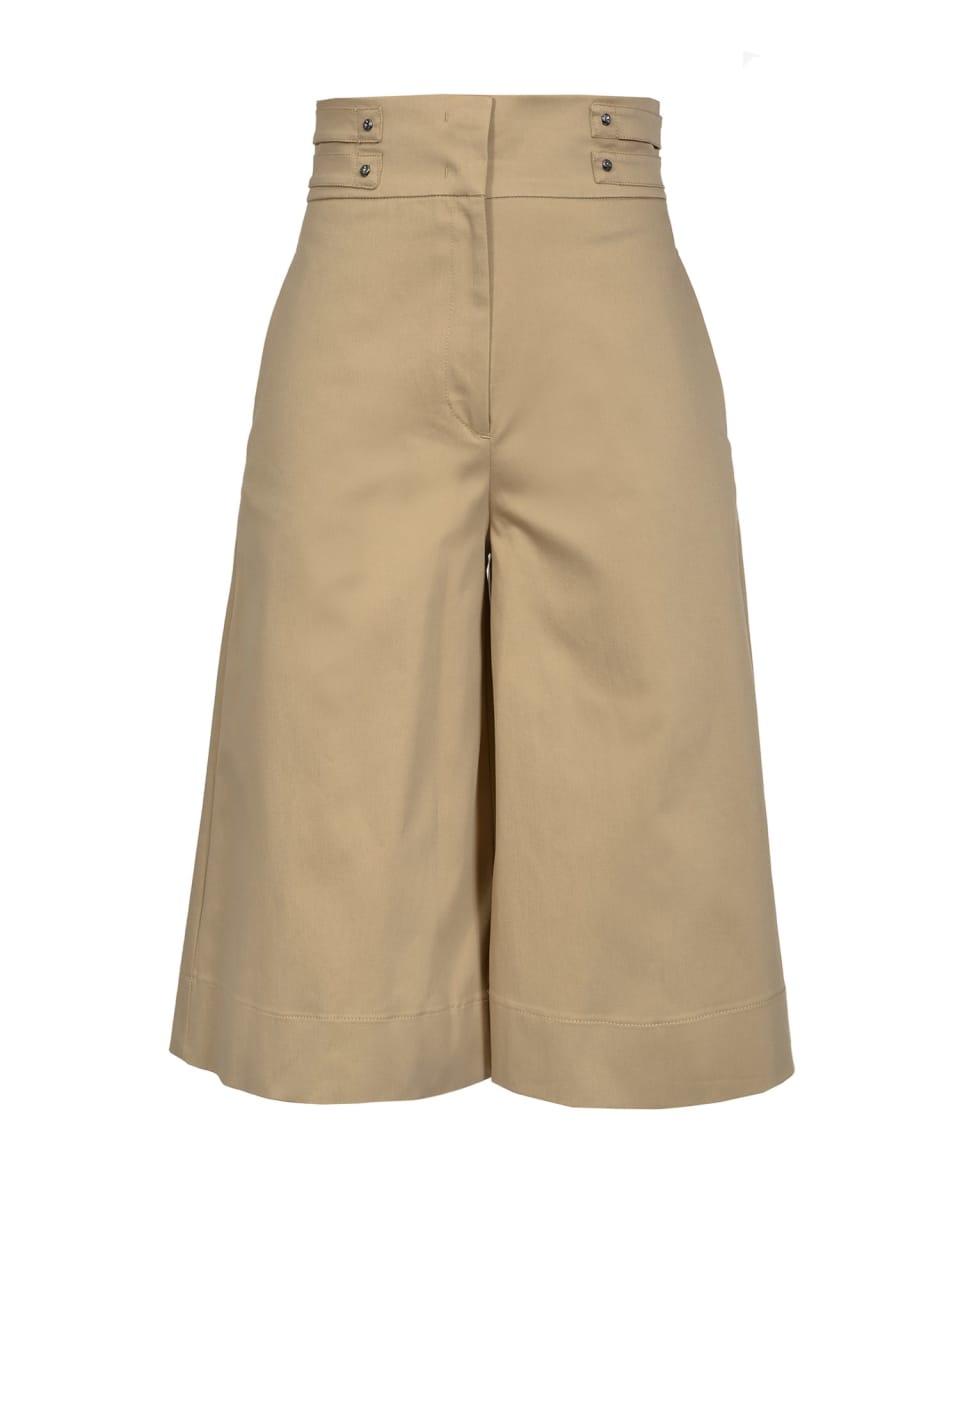 Safari style Bermuda shorts